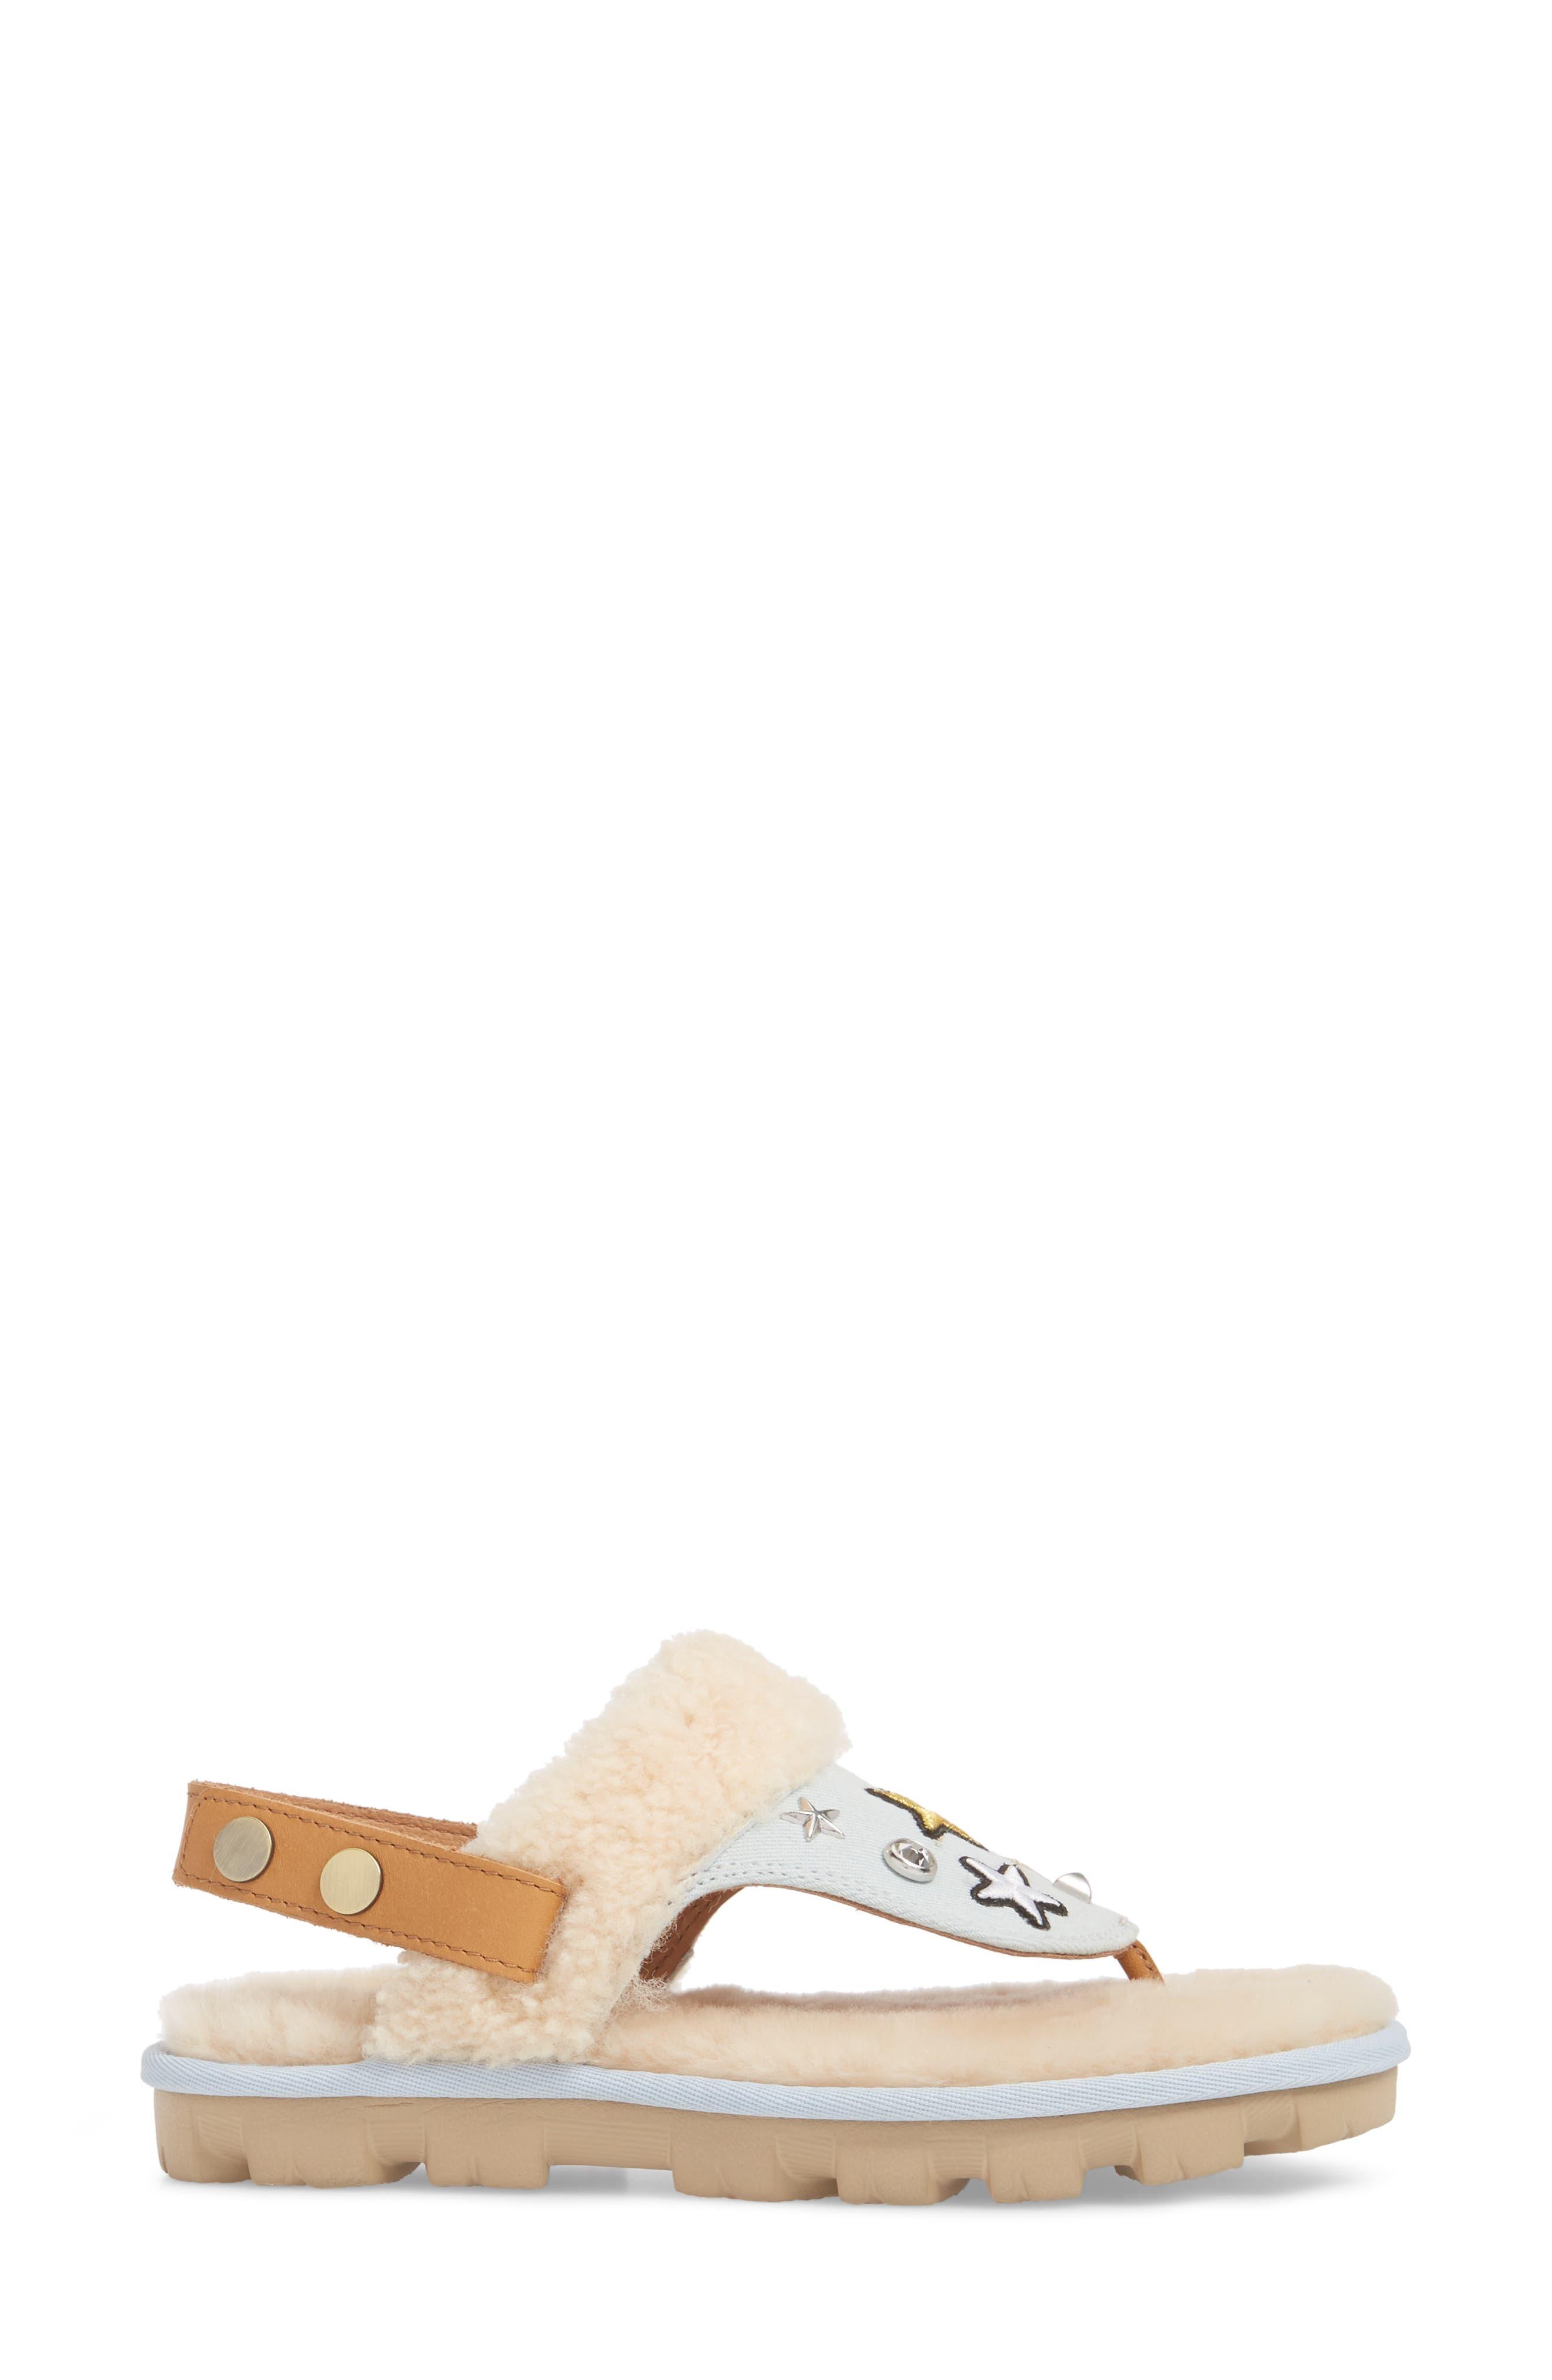 Patch It Slingback Sandal with Genuine Shearling Trim,                             Alternate thumbnail 3, color,                             Bleach Denim